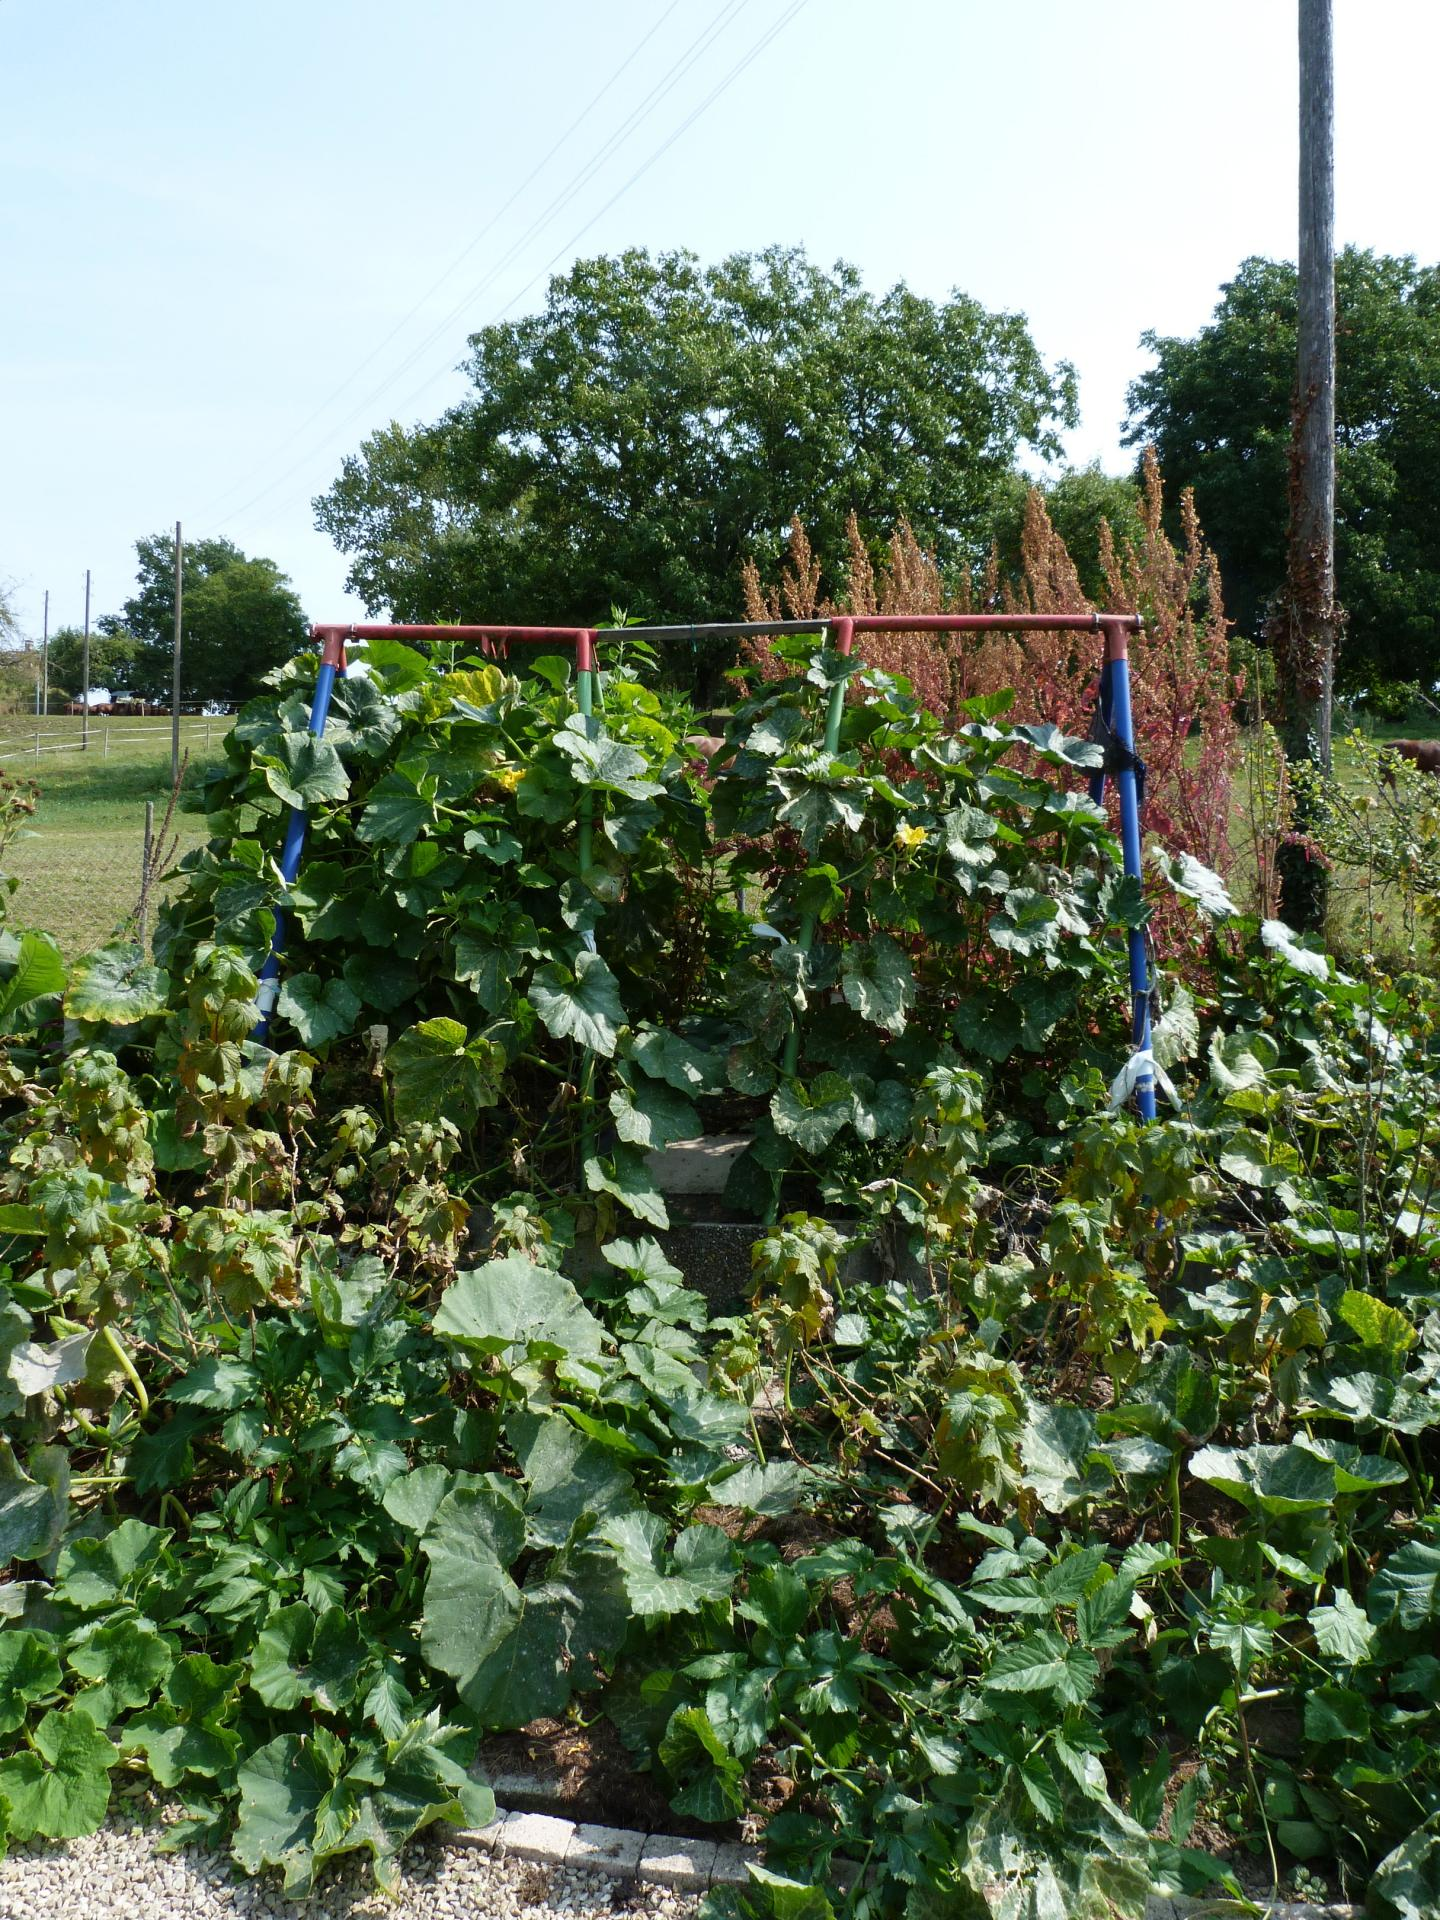 Jardinles especes courgesetcassis 31